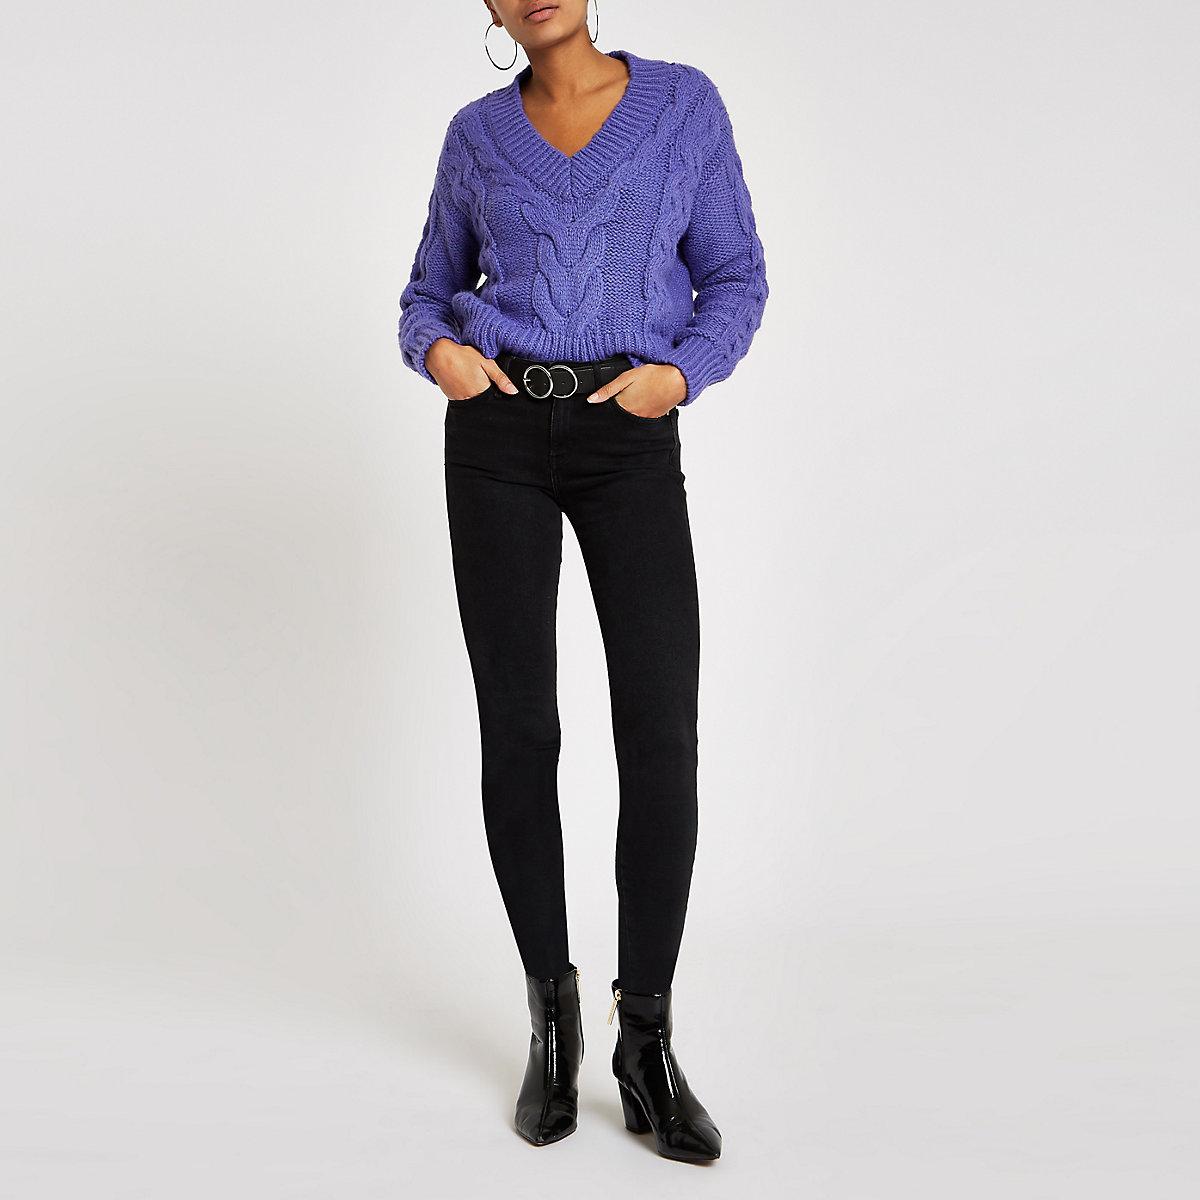 Purple cable knit V neck jumper